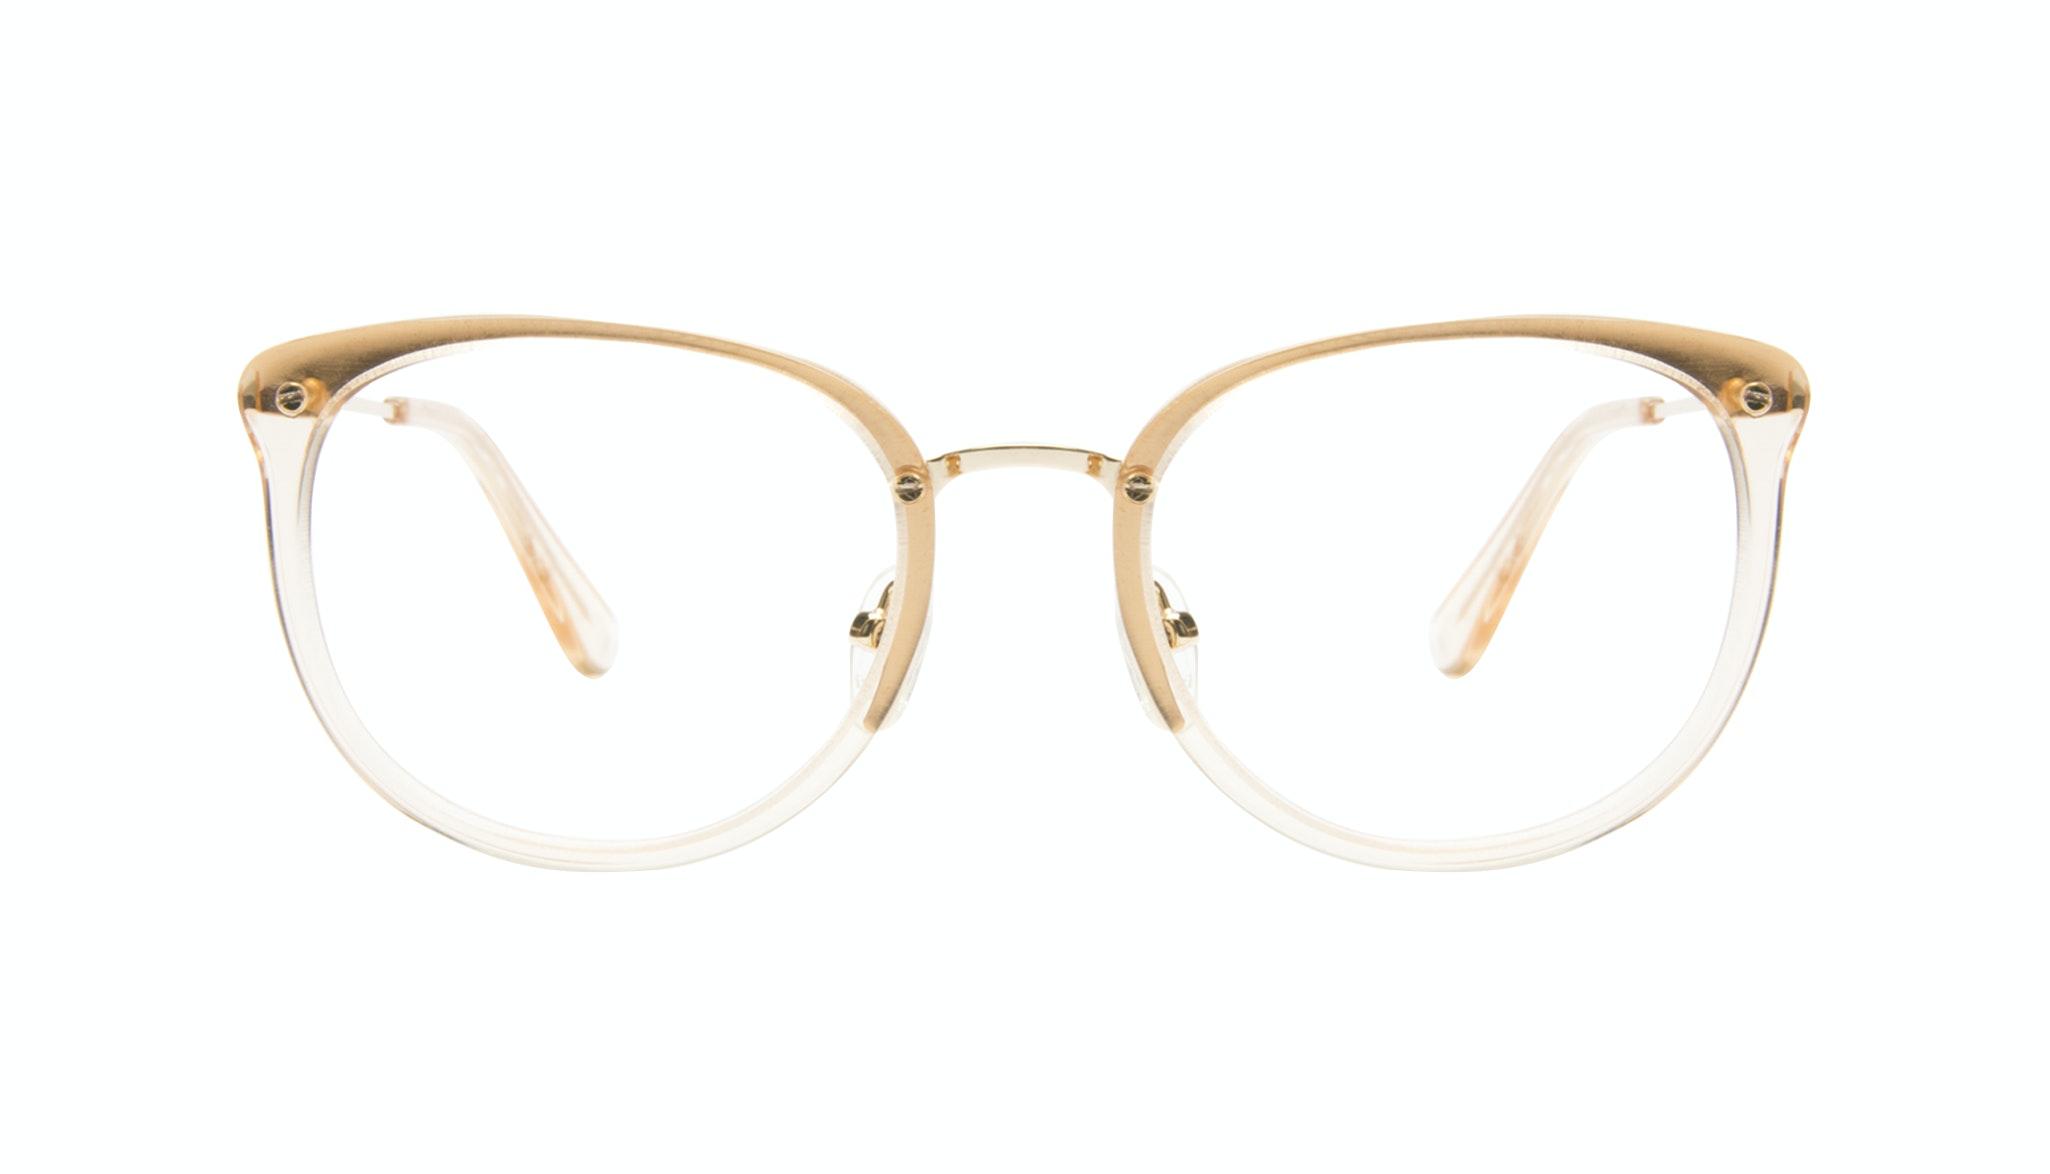 Affordable Fashion Glasses Square Round Eyeglasses Women Amaze Blond Metal Front